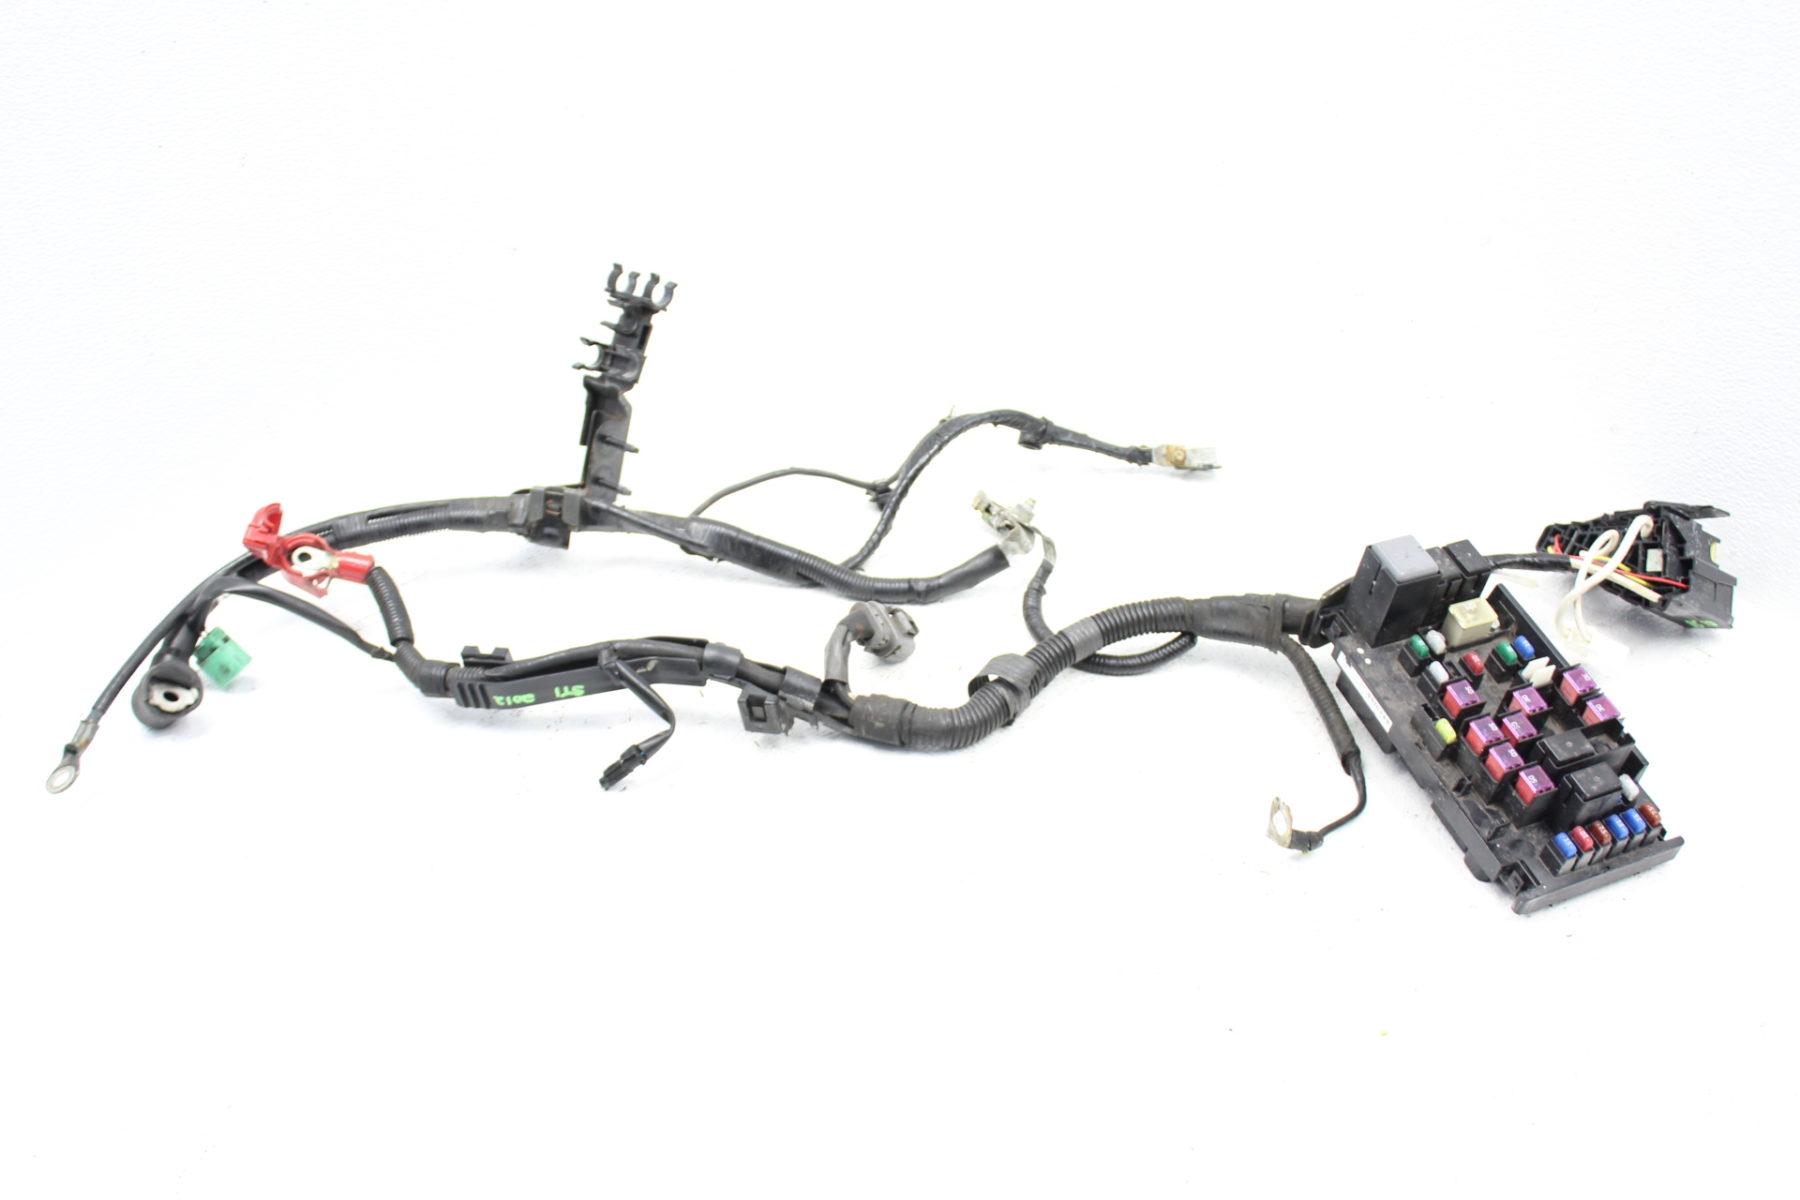 Subaru Wrx Amp Sti Fuse Box Wire Wiring Harness